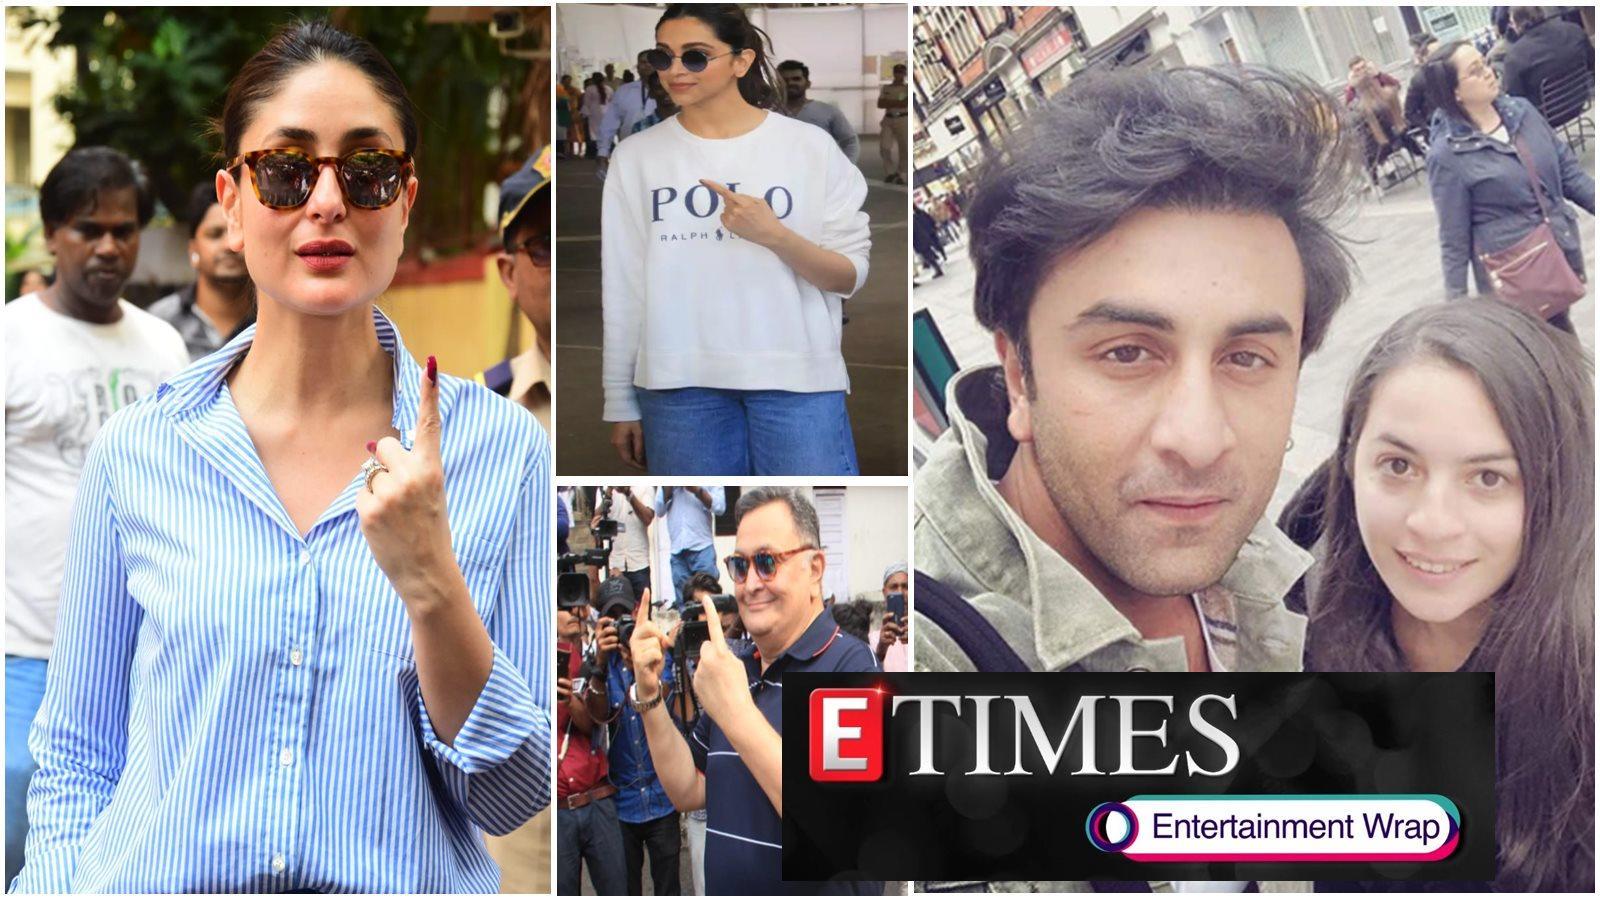 kareena-kapoor-deepika-padukone-cast-their-vote-in-mumbai-ranbir-kapoor-looks-dashing-as-he-poses-for-selfie-with-fan-in-london-and-more-